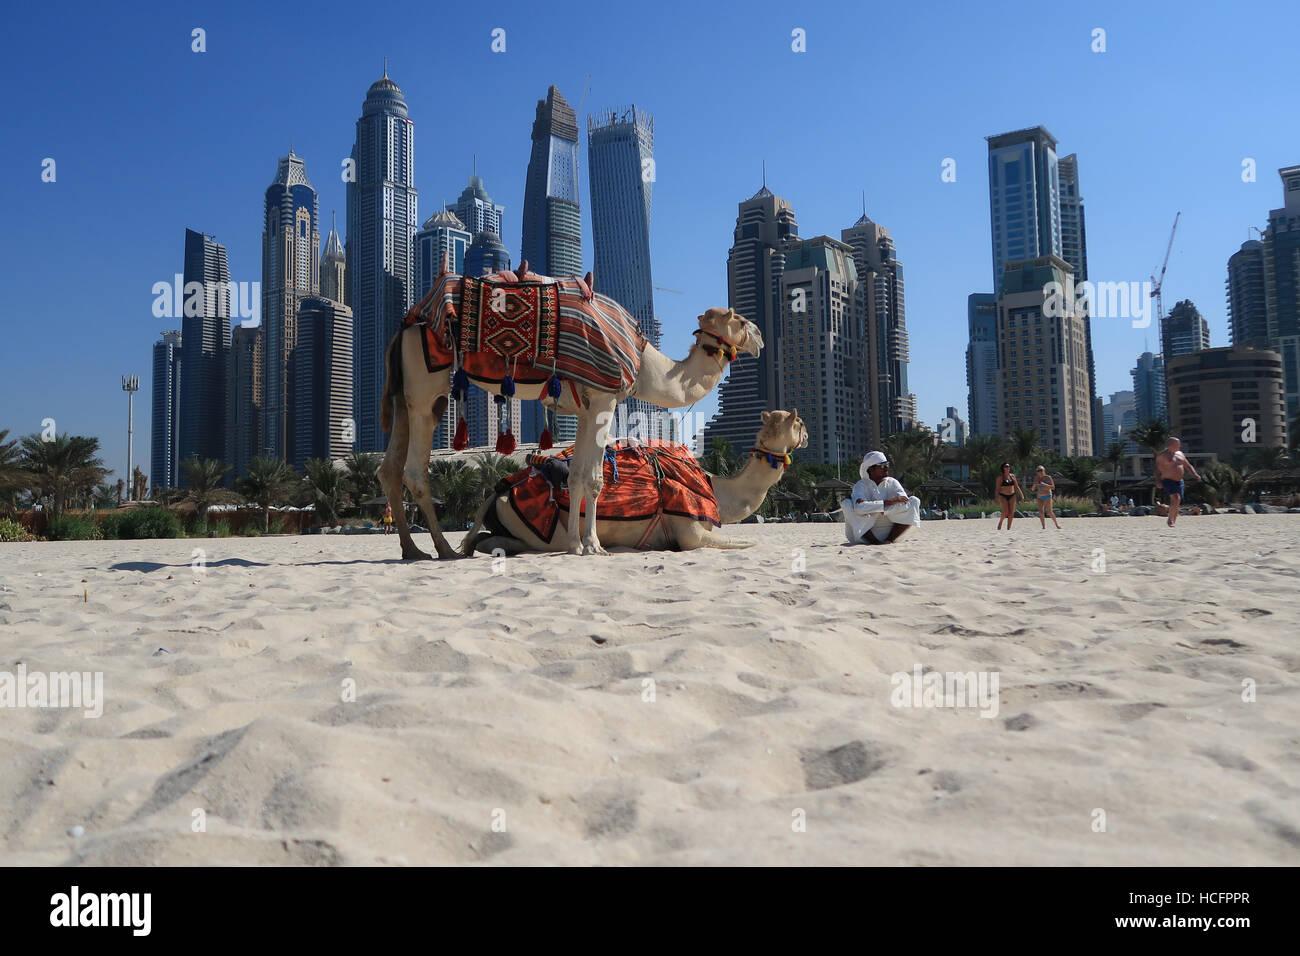 Emirati man with two camels on Jumeirah Beach Dubai Stock Photo